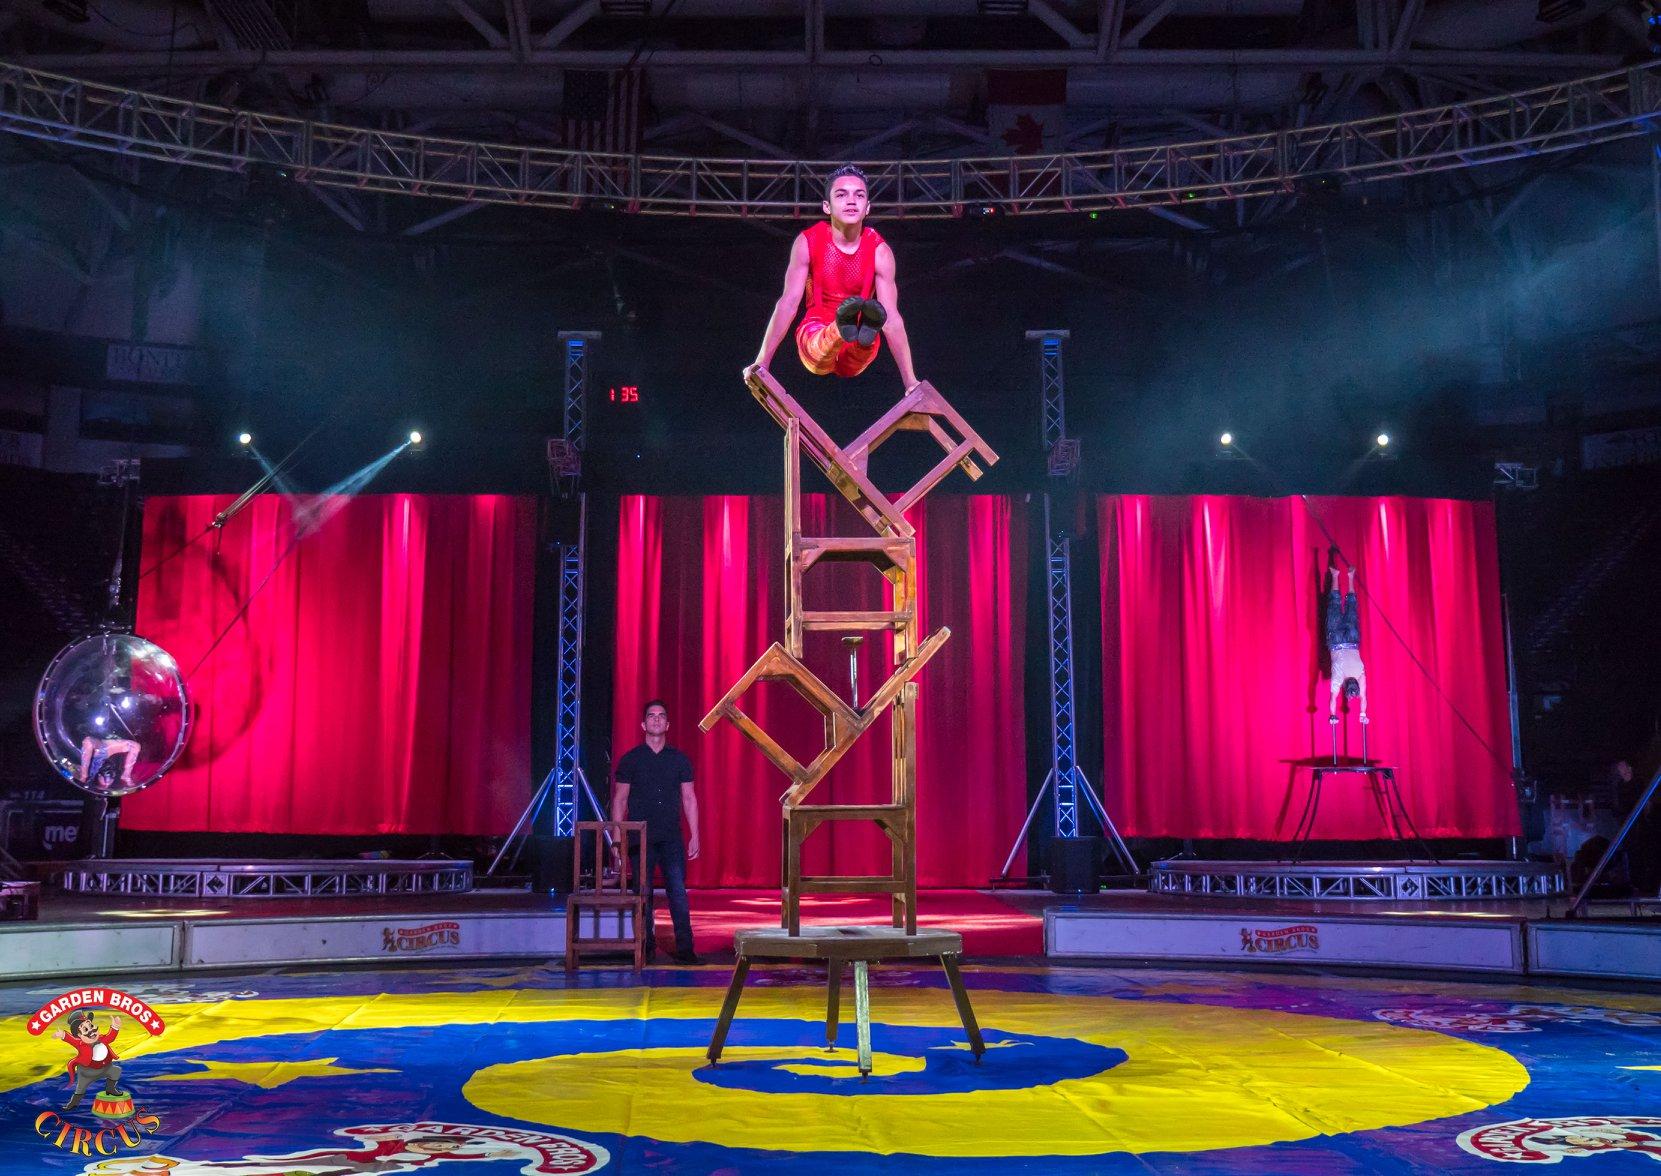 Official Garden Bros Circus Tickets Kissimmee Fl 7 30pm 11 24 2020 Tuesday